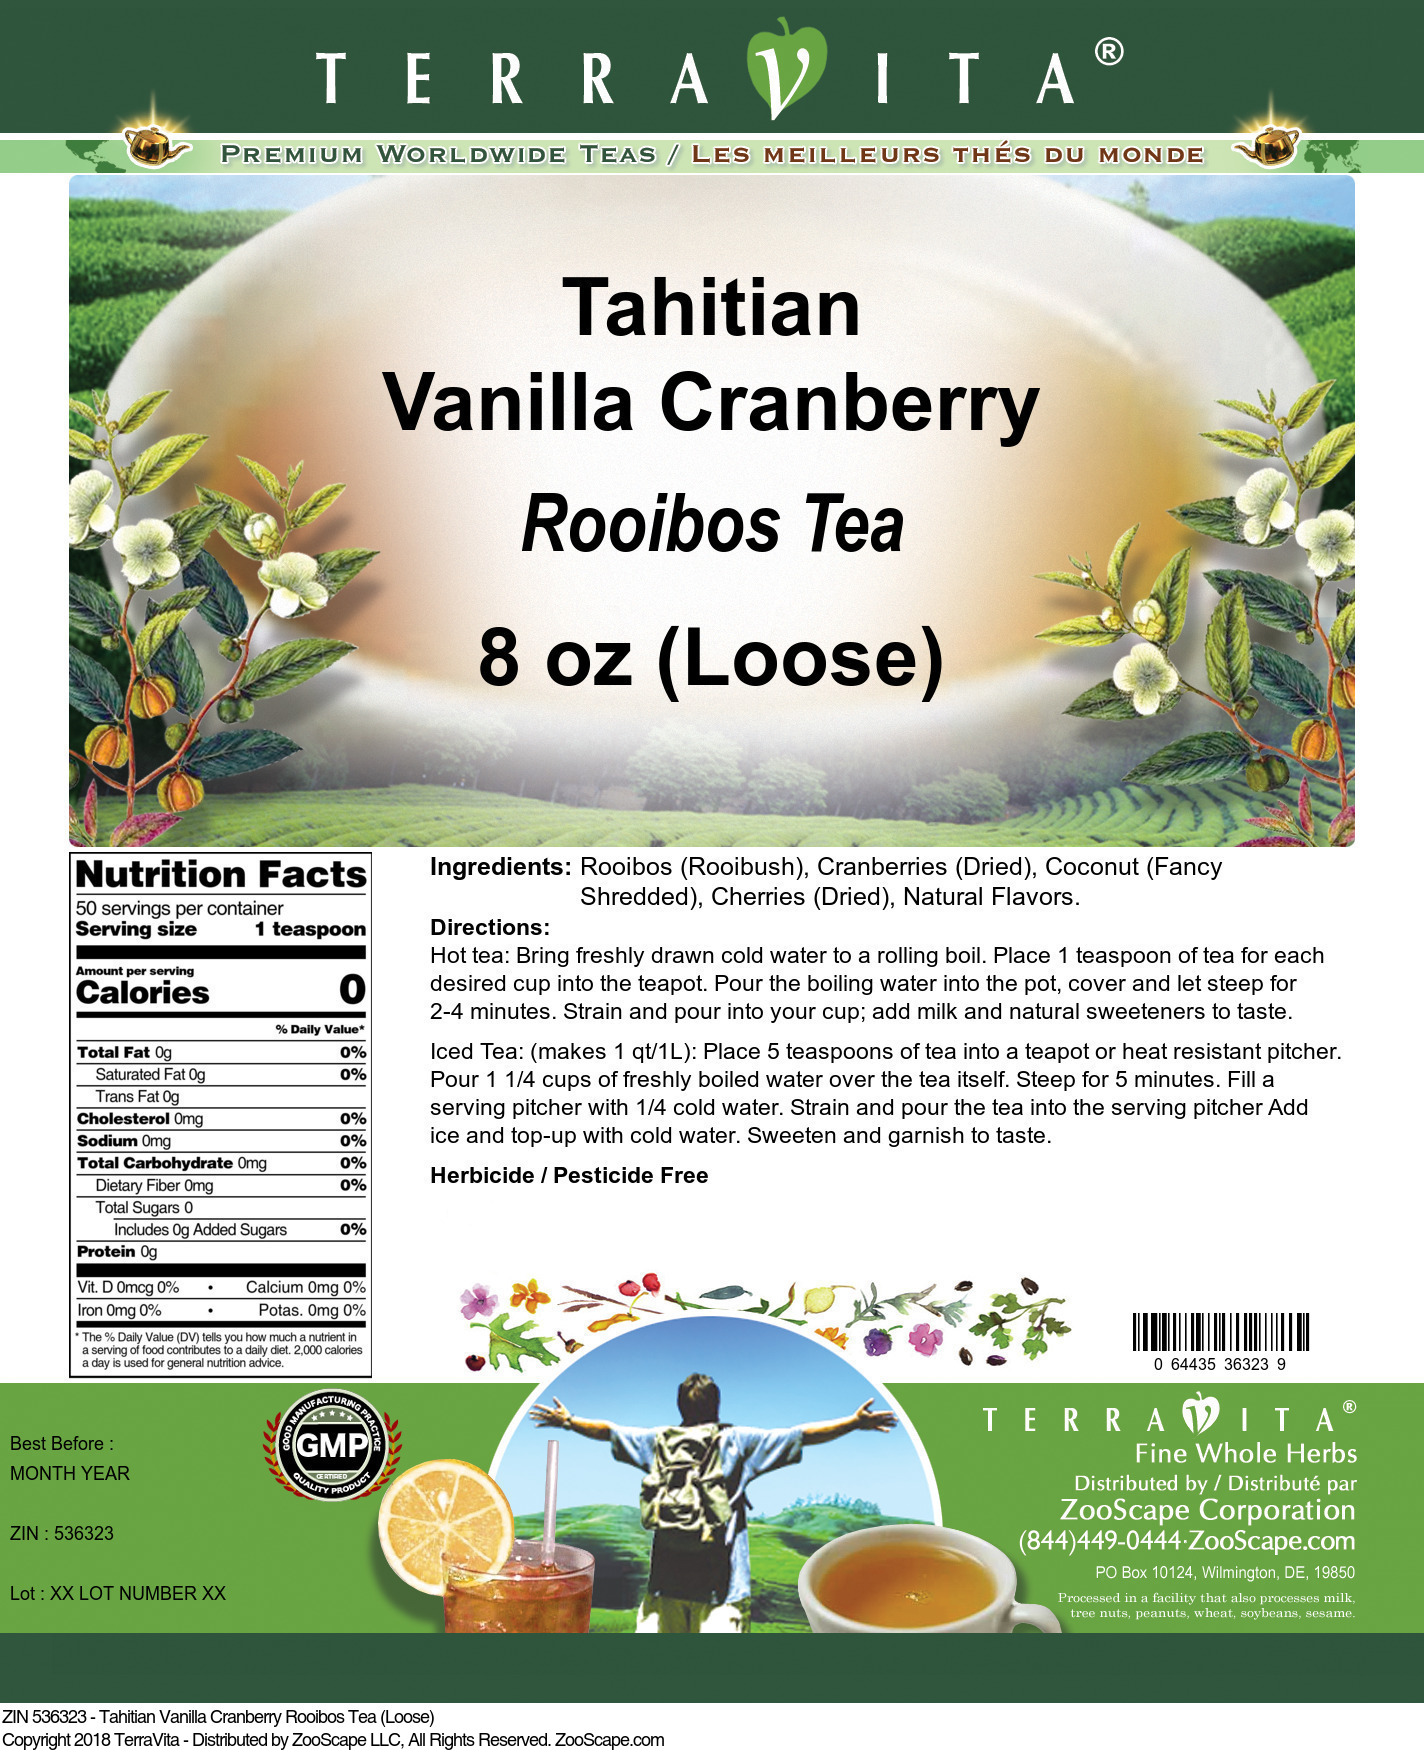 Tahitian Vanilla Cranberry Rooibos Tea (Loose)